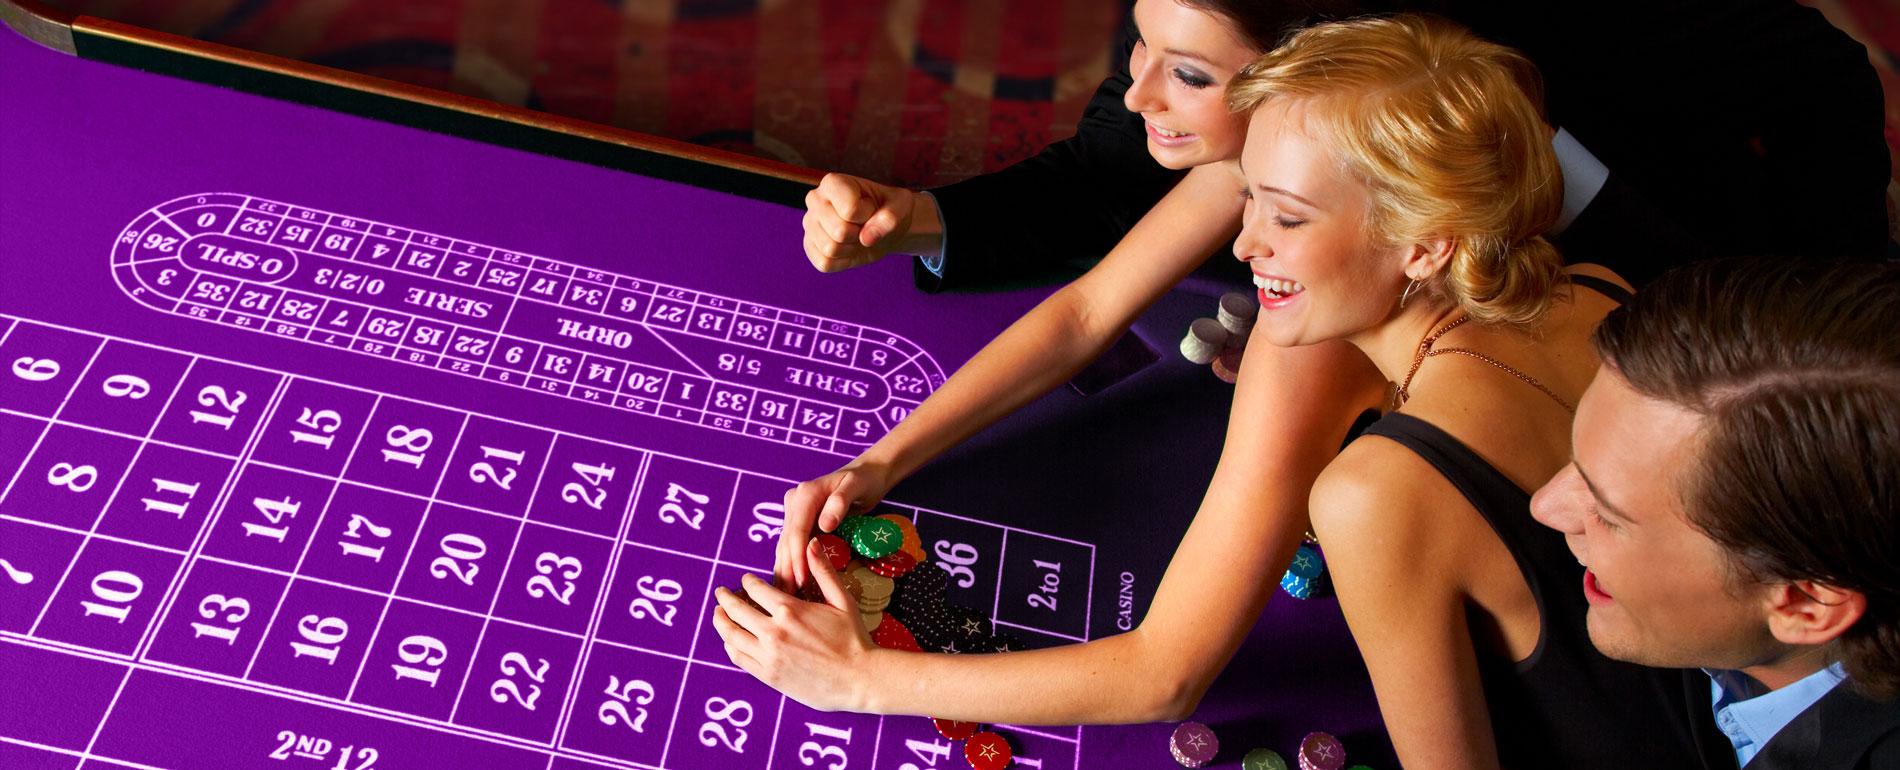 PA casino roulette table